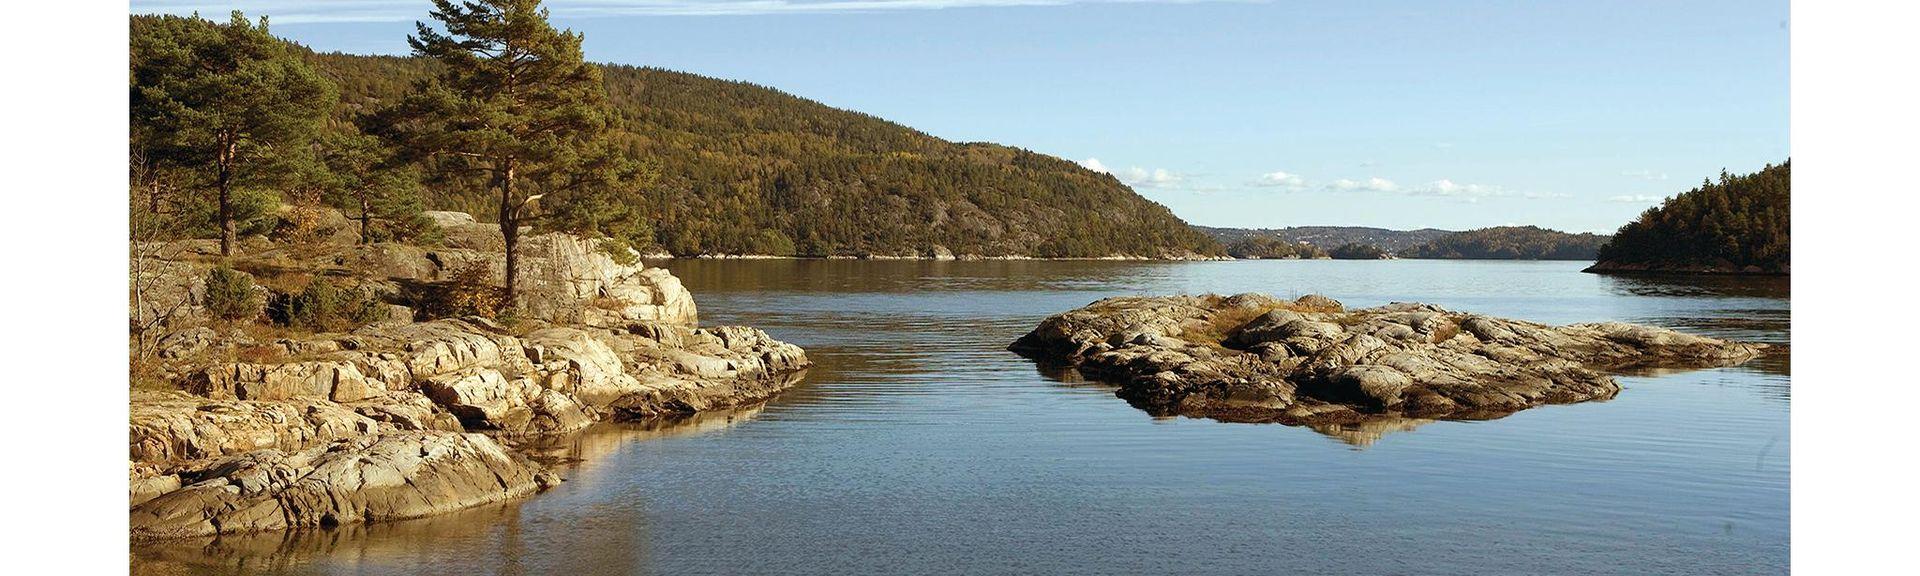 Sætre, Akershus, Noruega